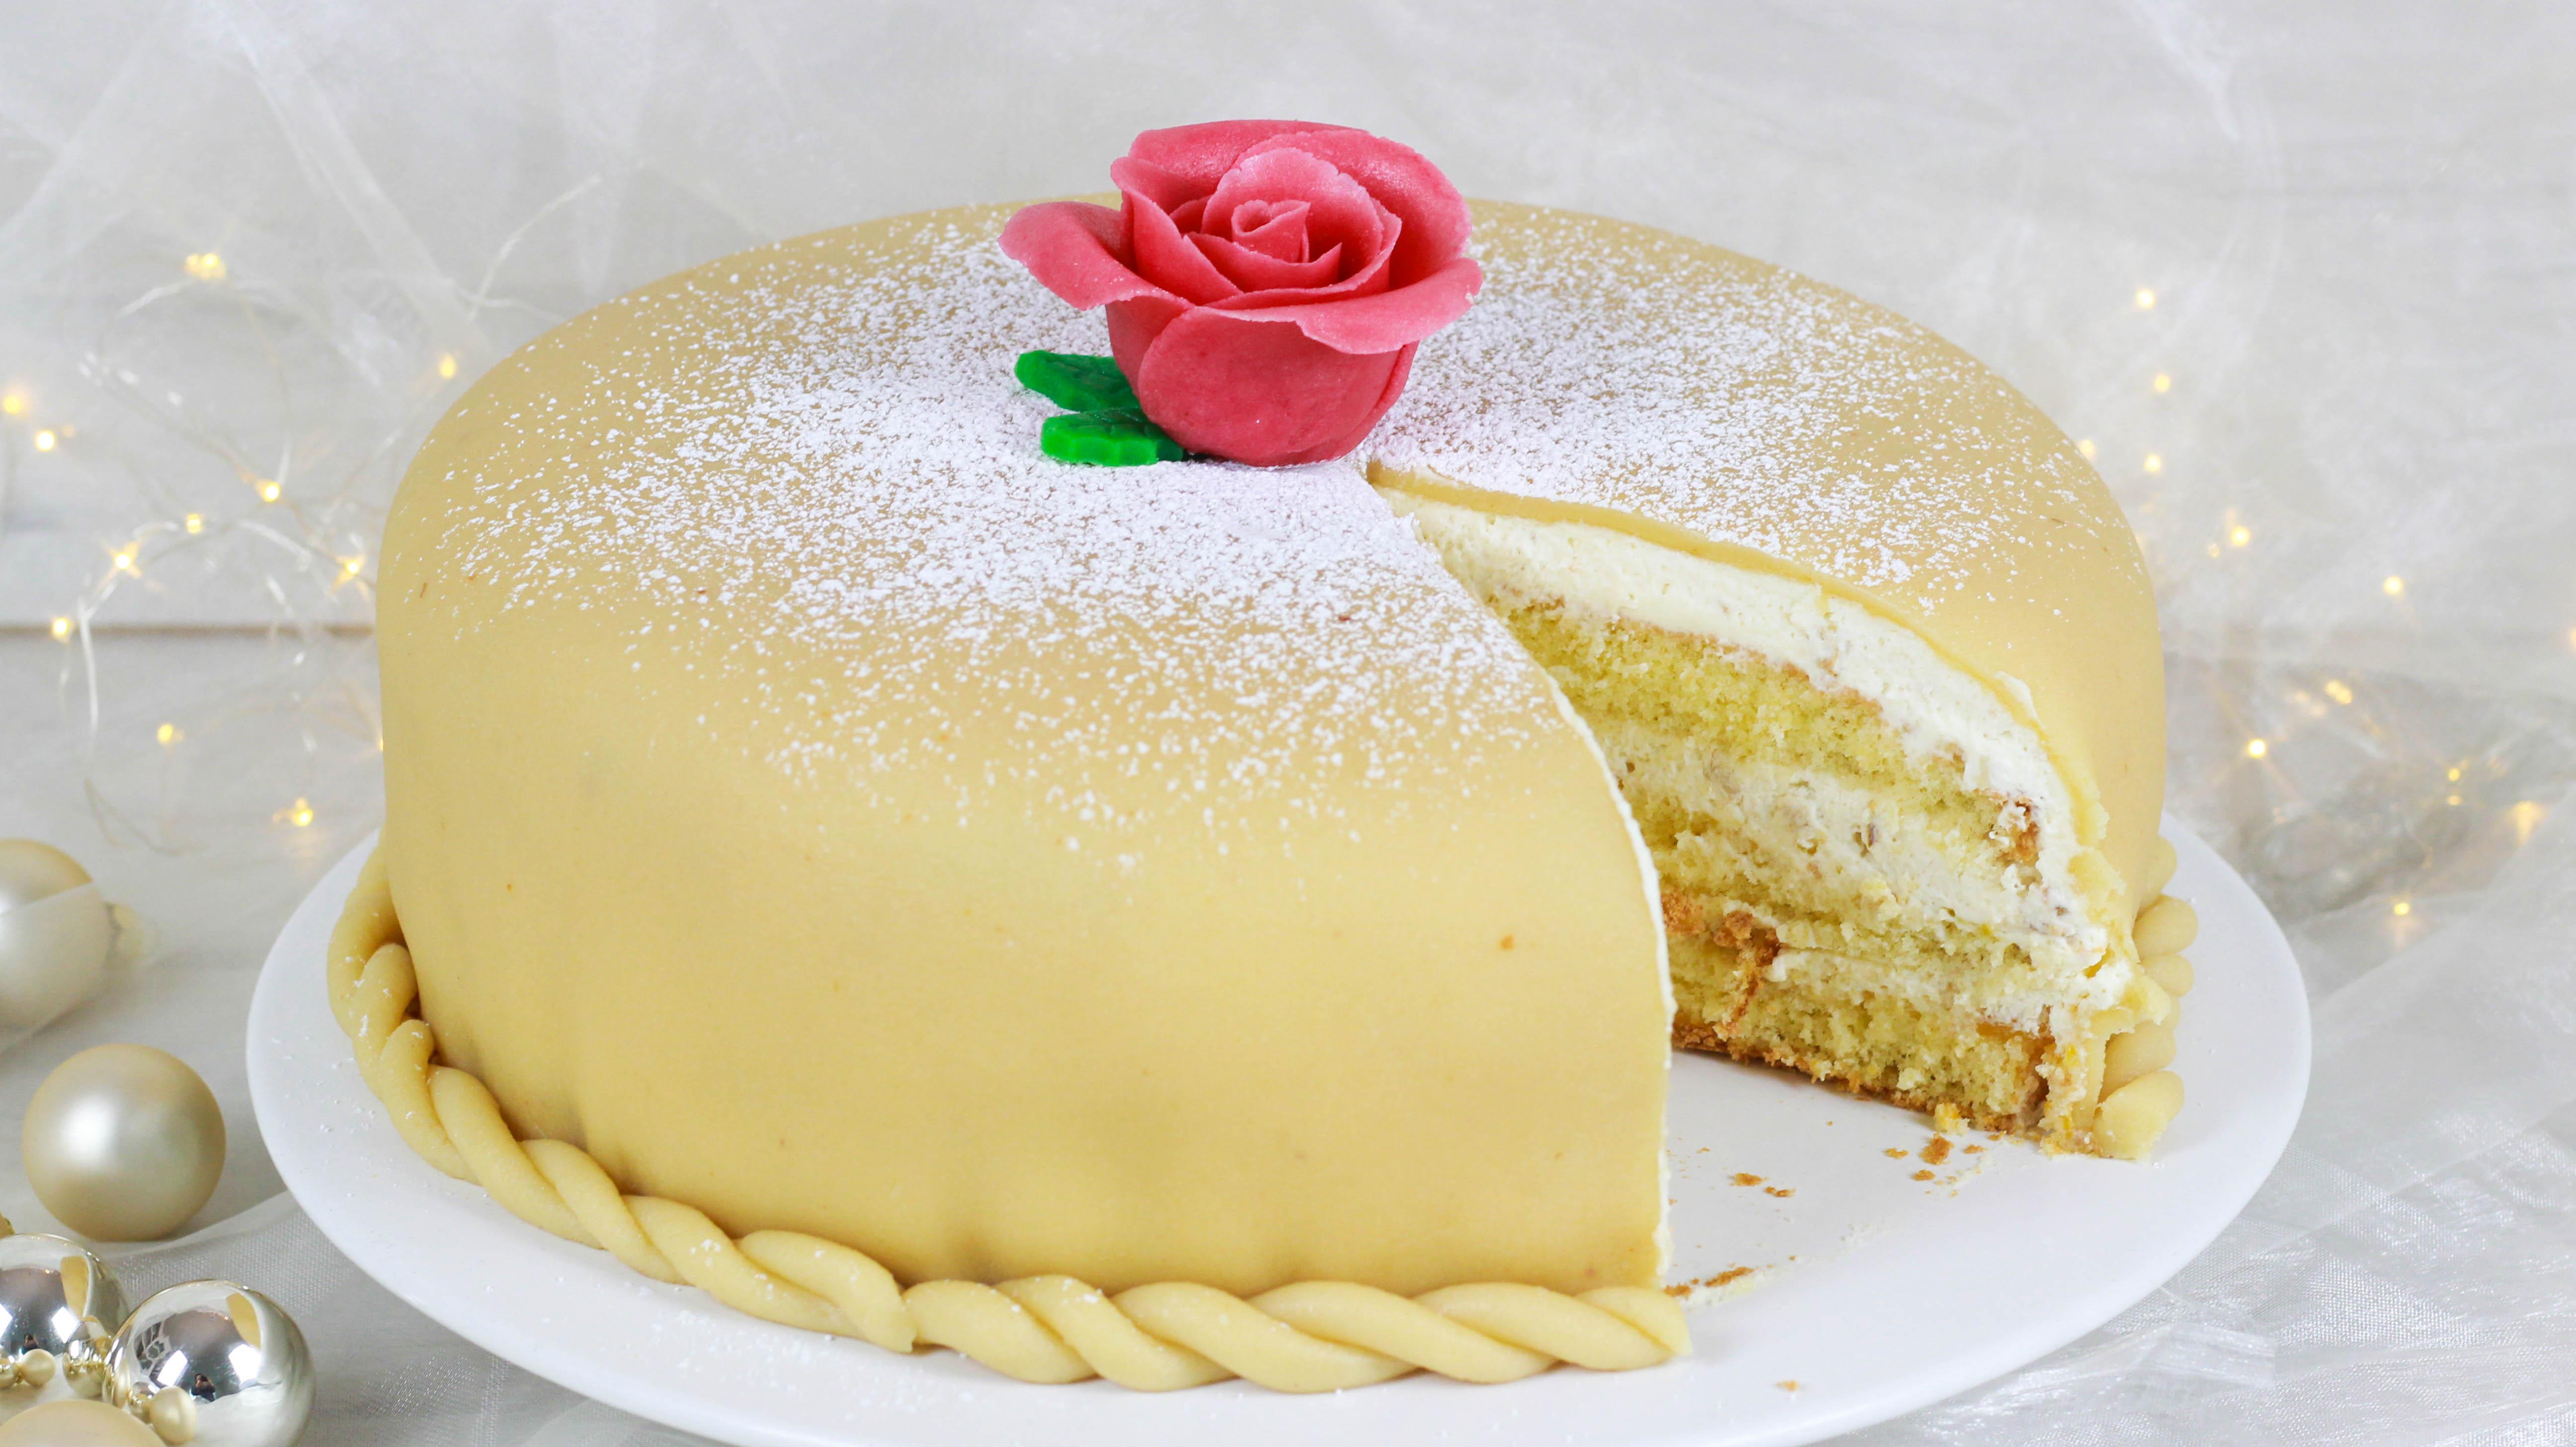 Rezept: Festliche Nougat-Marzipan-Torte I Nikolaus Gewinnspiel